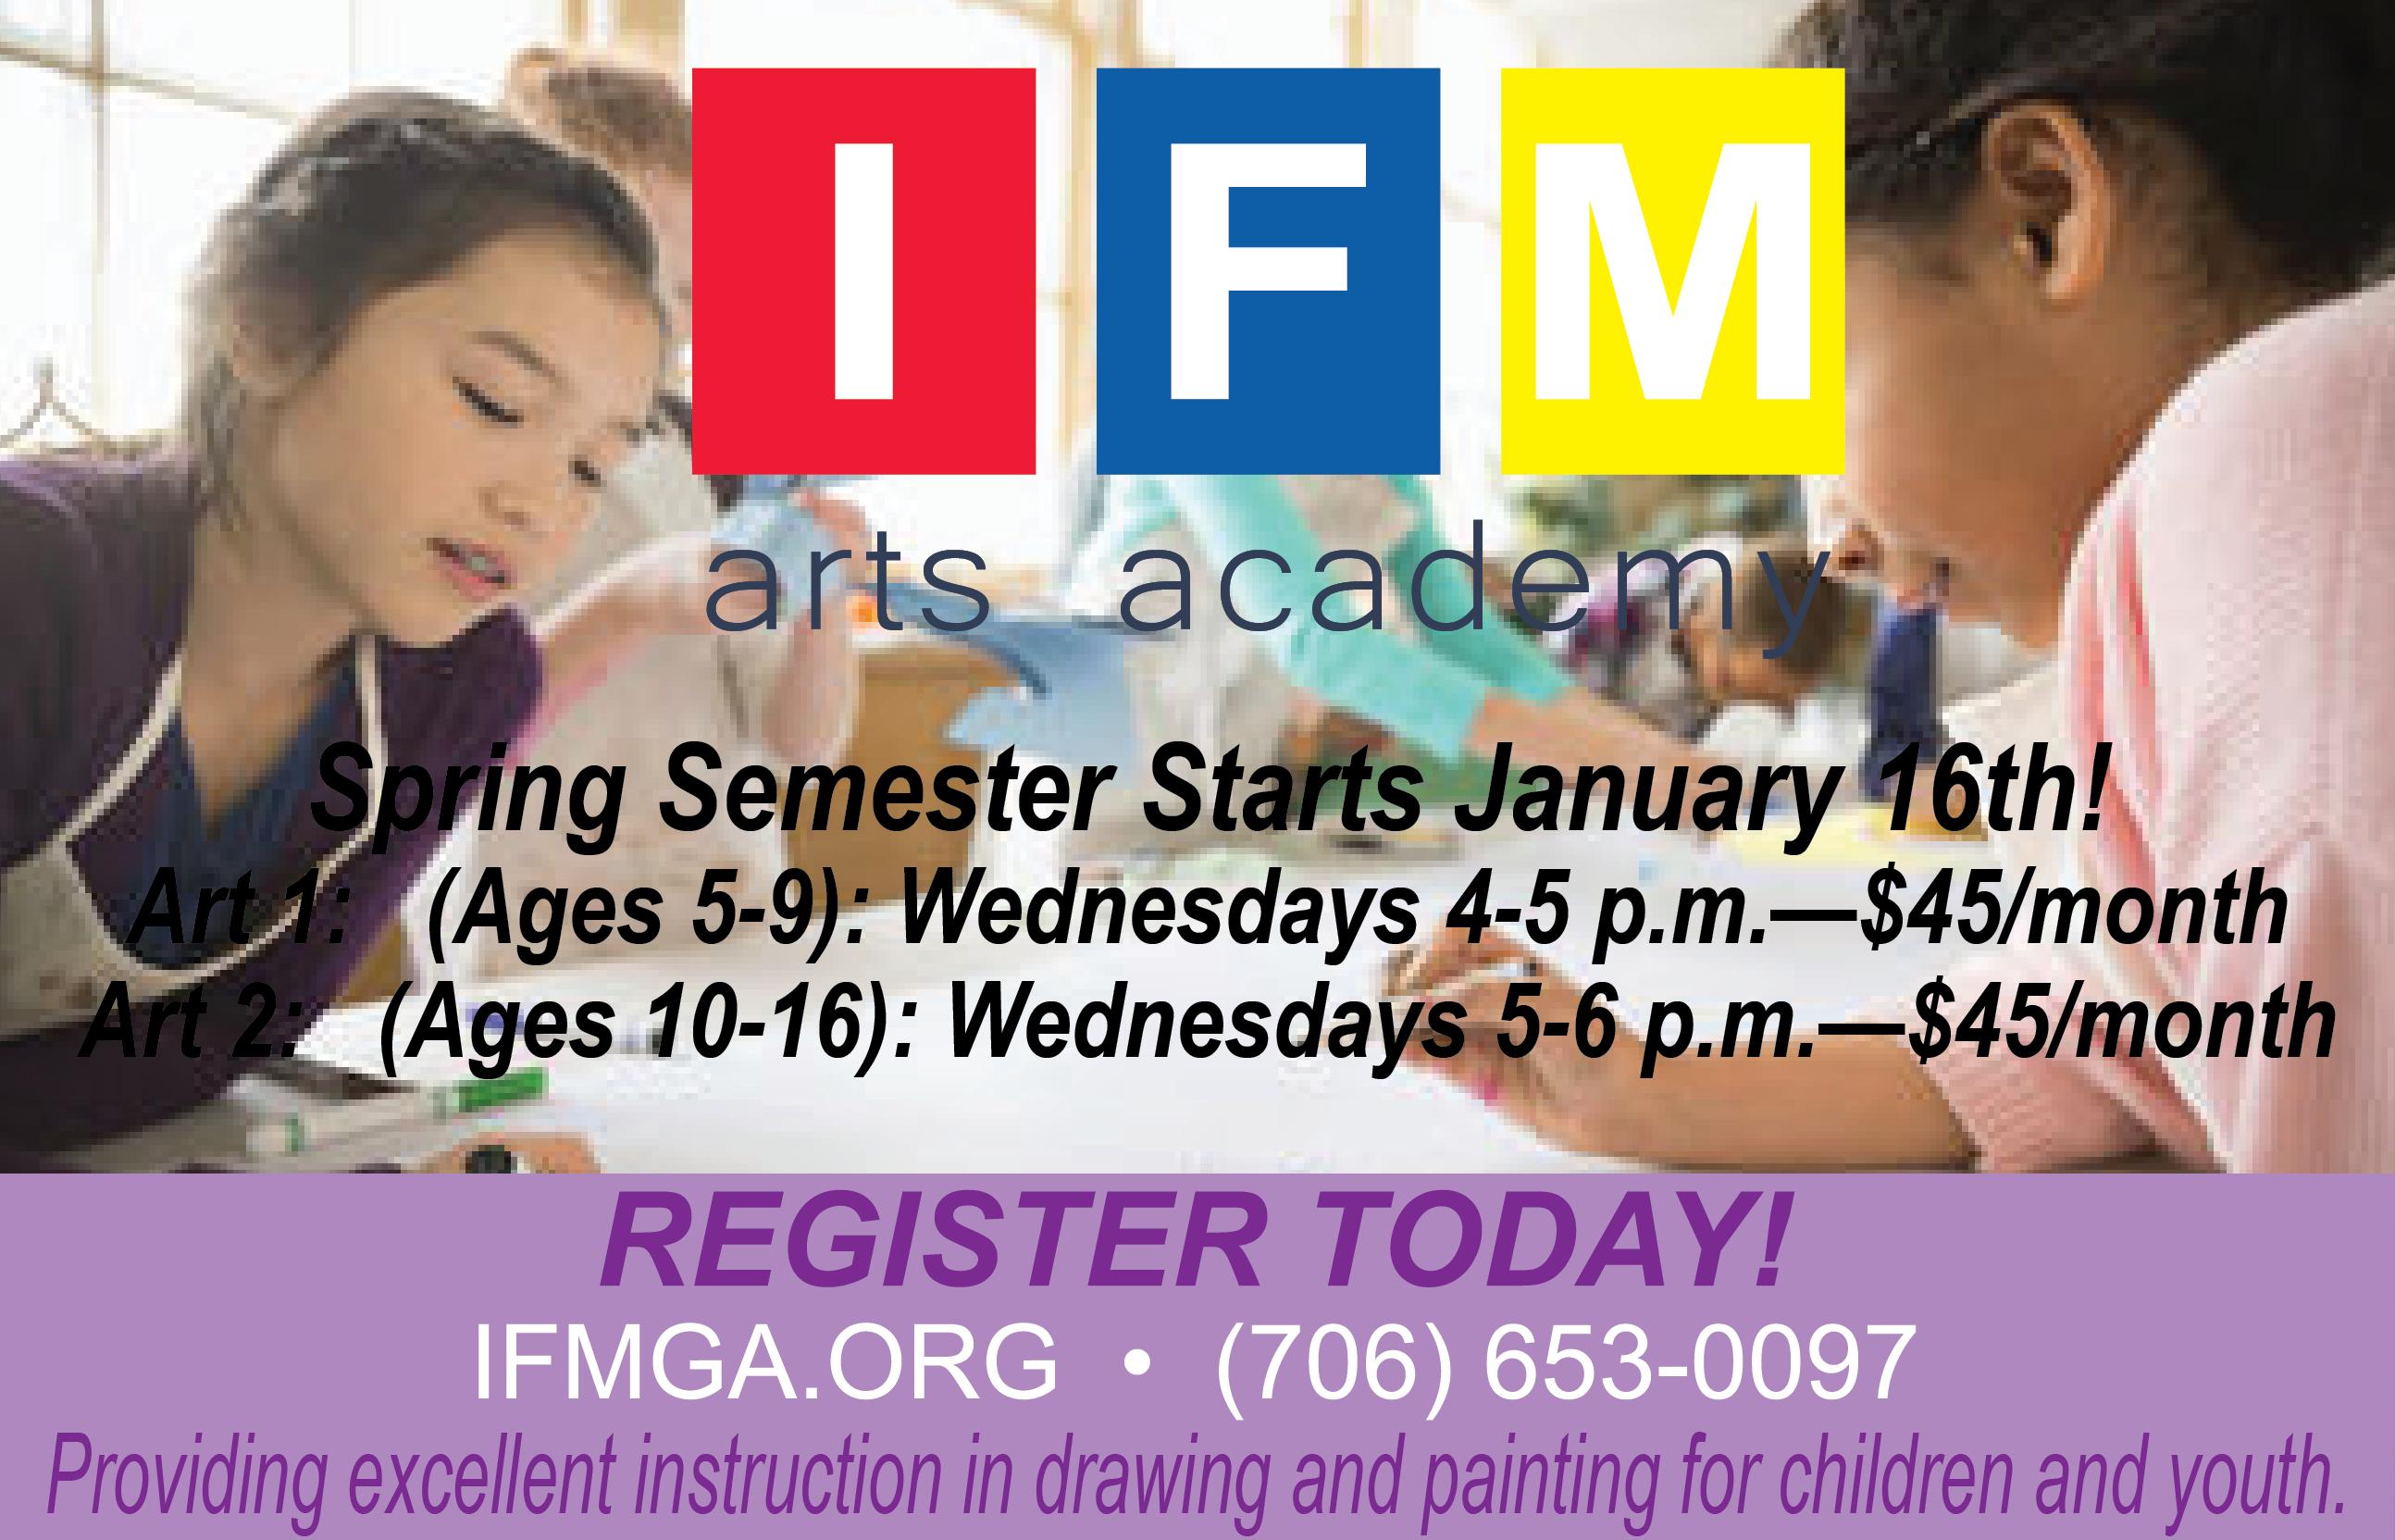 IFM Arts Academy Spring Semester - Muscogee Moms